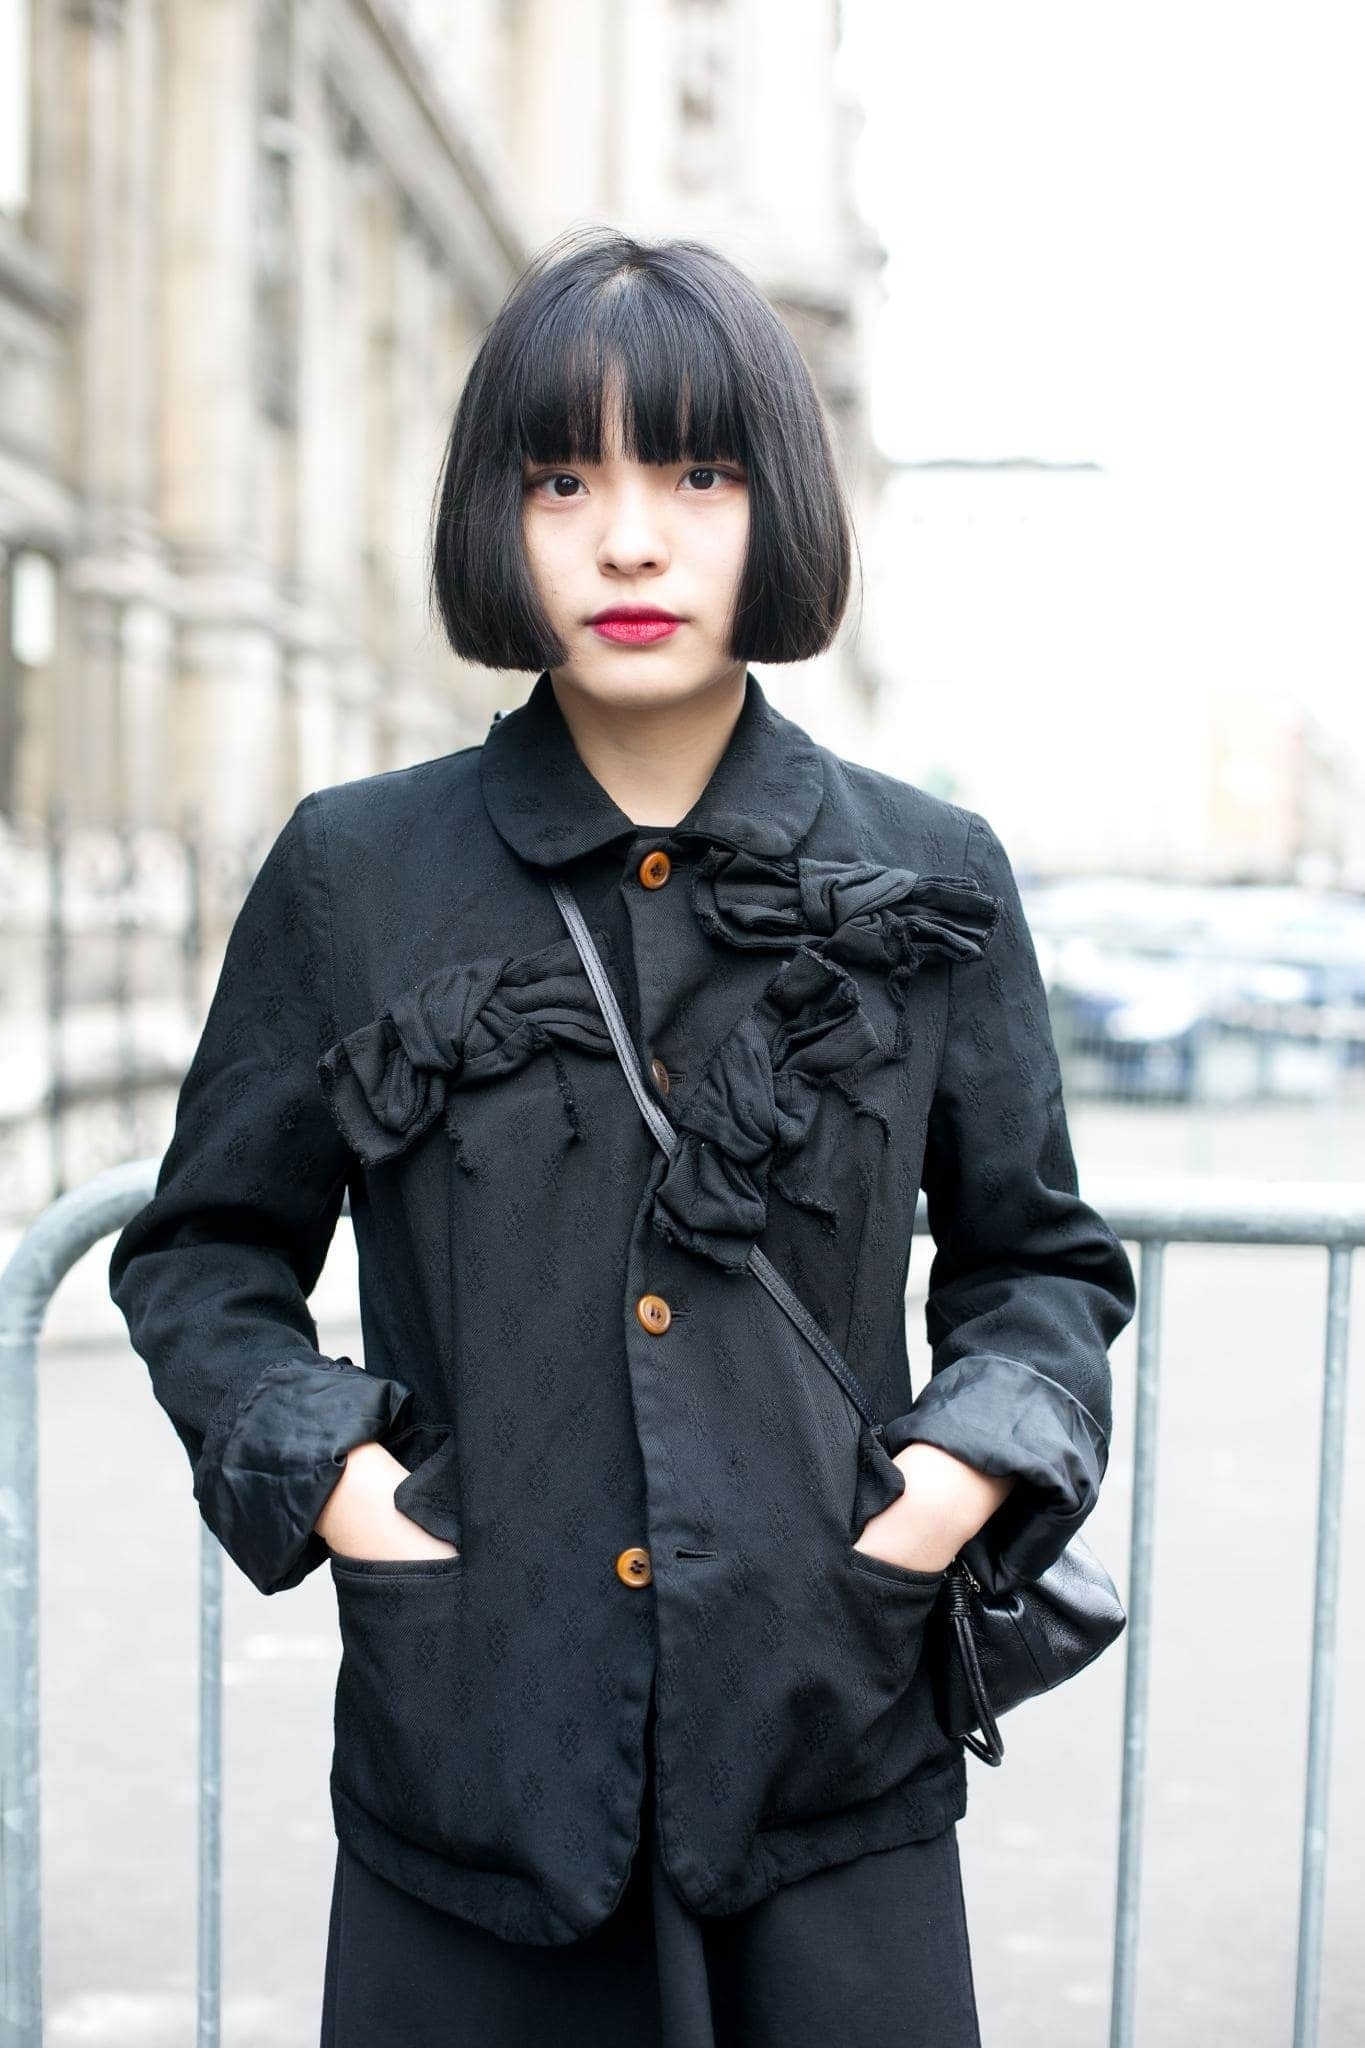 The Trendiest Korean Short Hairstyles To Get In On within Asian Short Hairstyles With Bangs